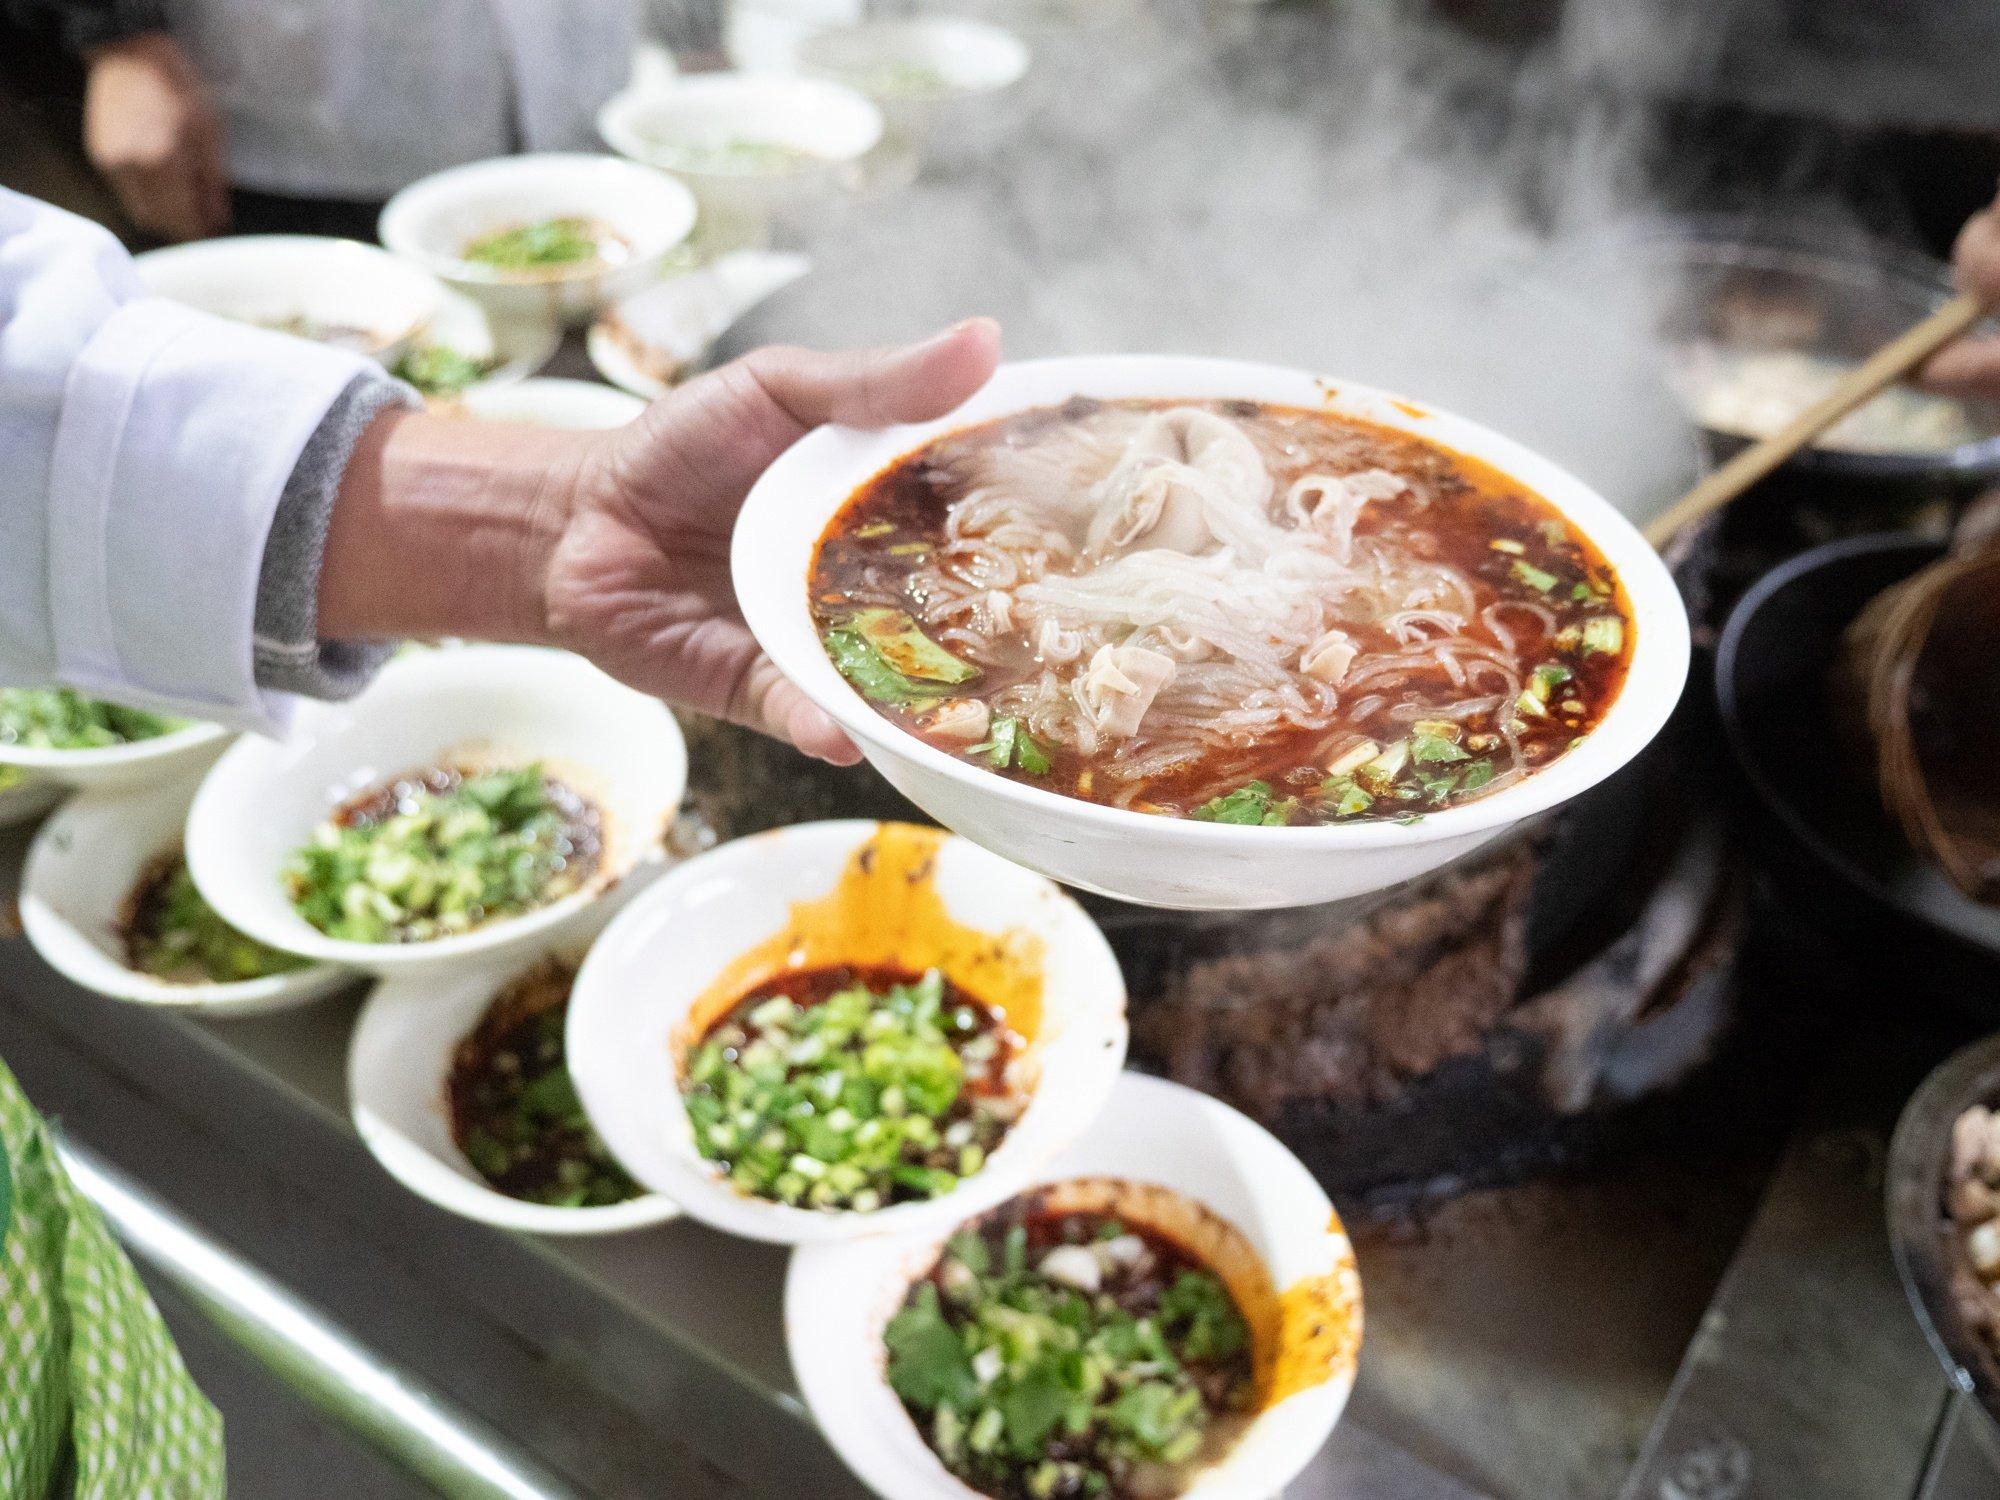 feichangfen sweet potato starch intestine noodles in chengdu